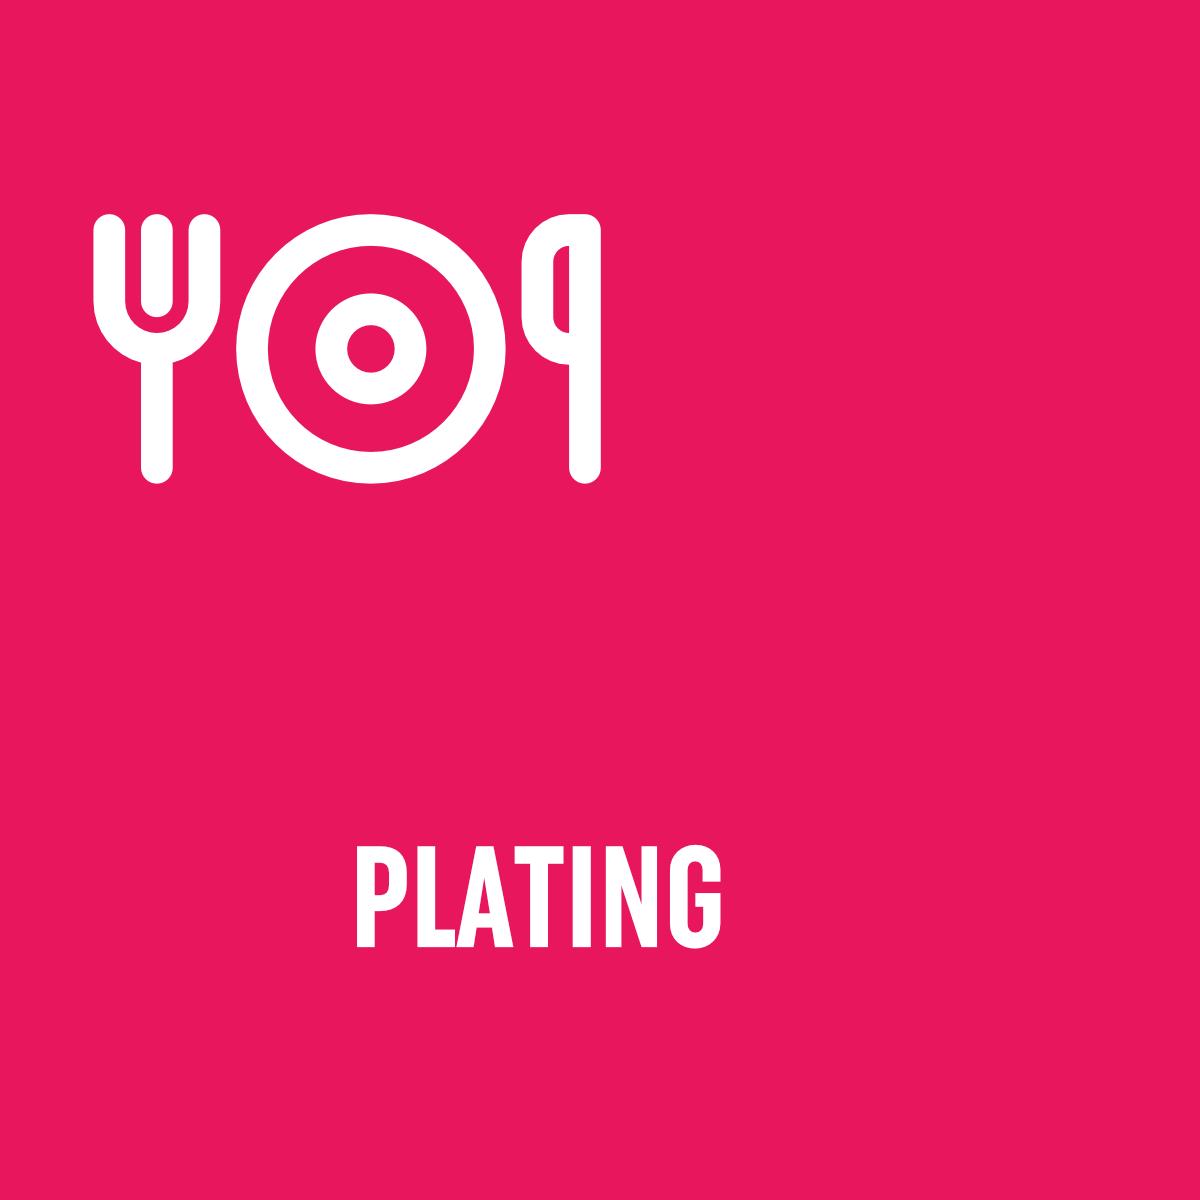 plating.png